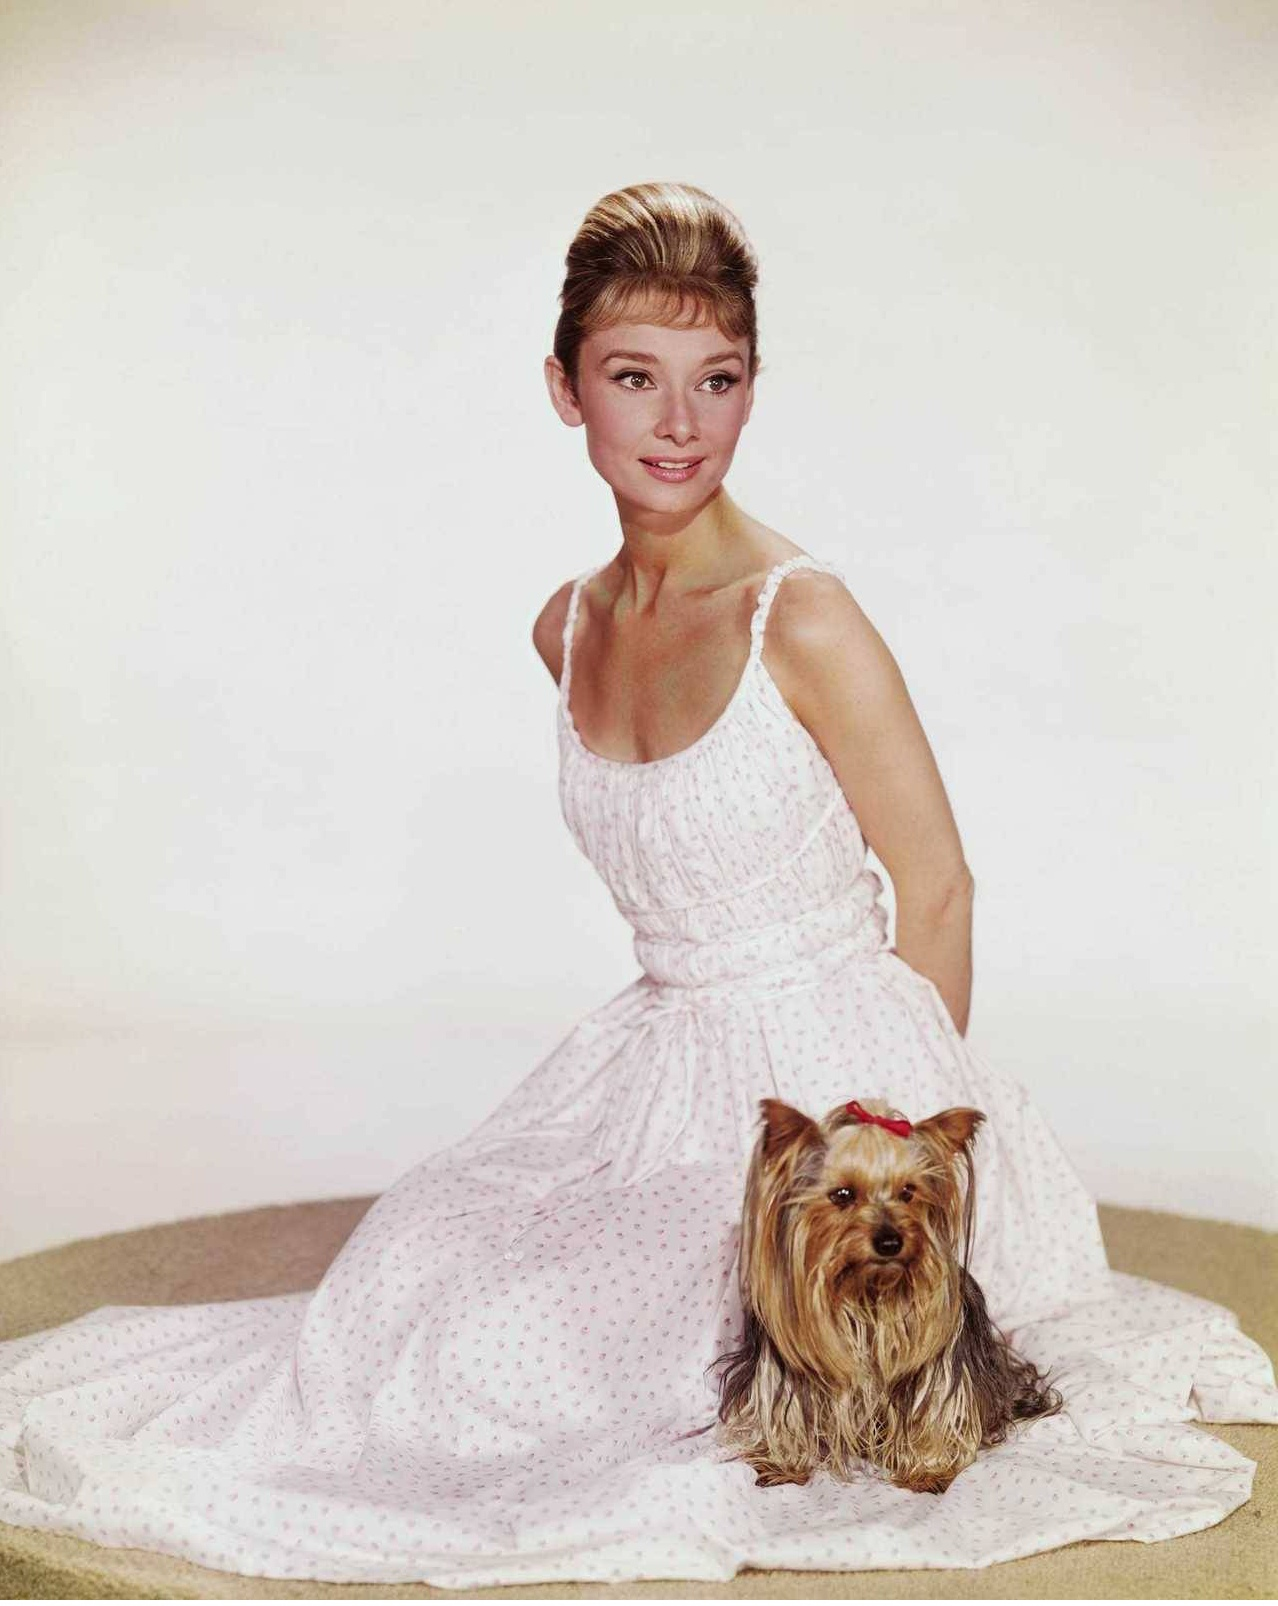 audrey-hepburn-photographed-with-mr-famous-her-yorkshire-terrier-c2a9-bud-fraker.jpg